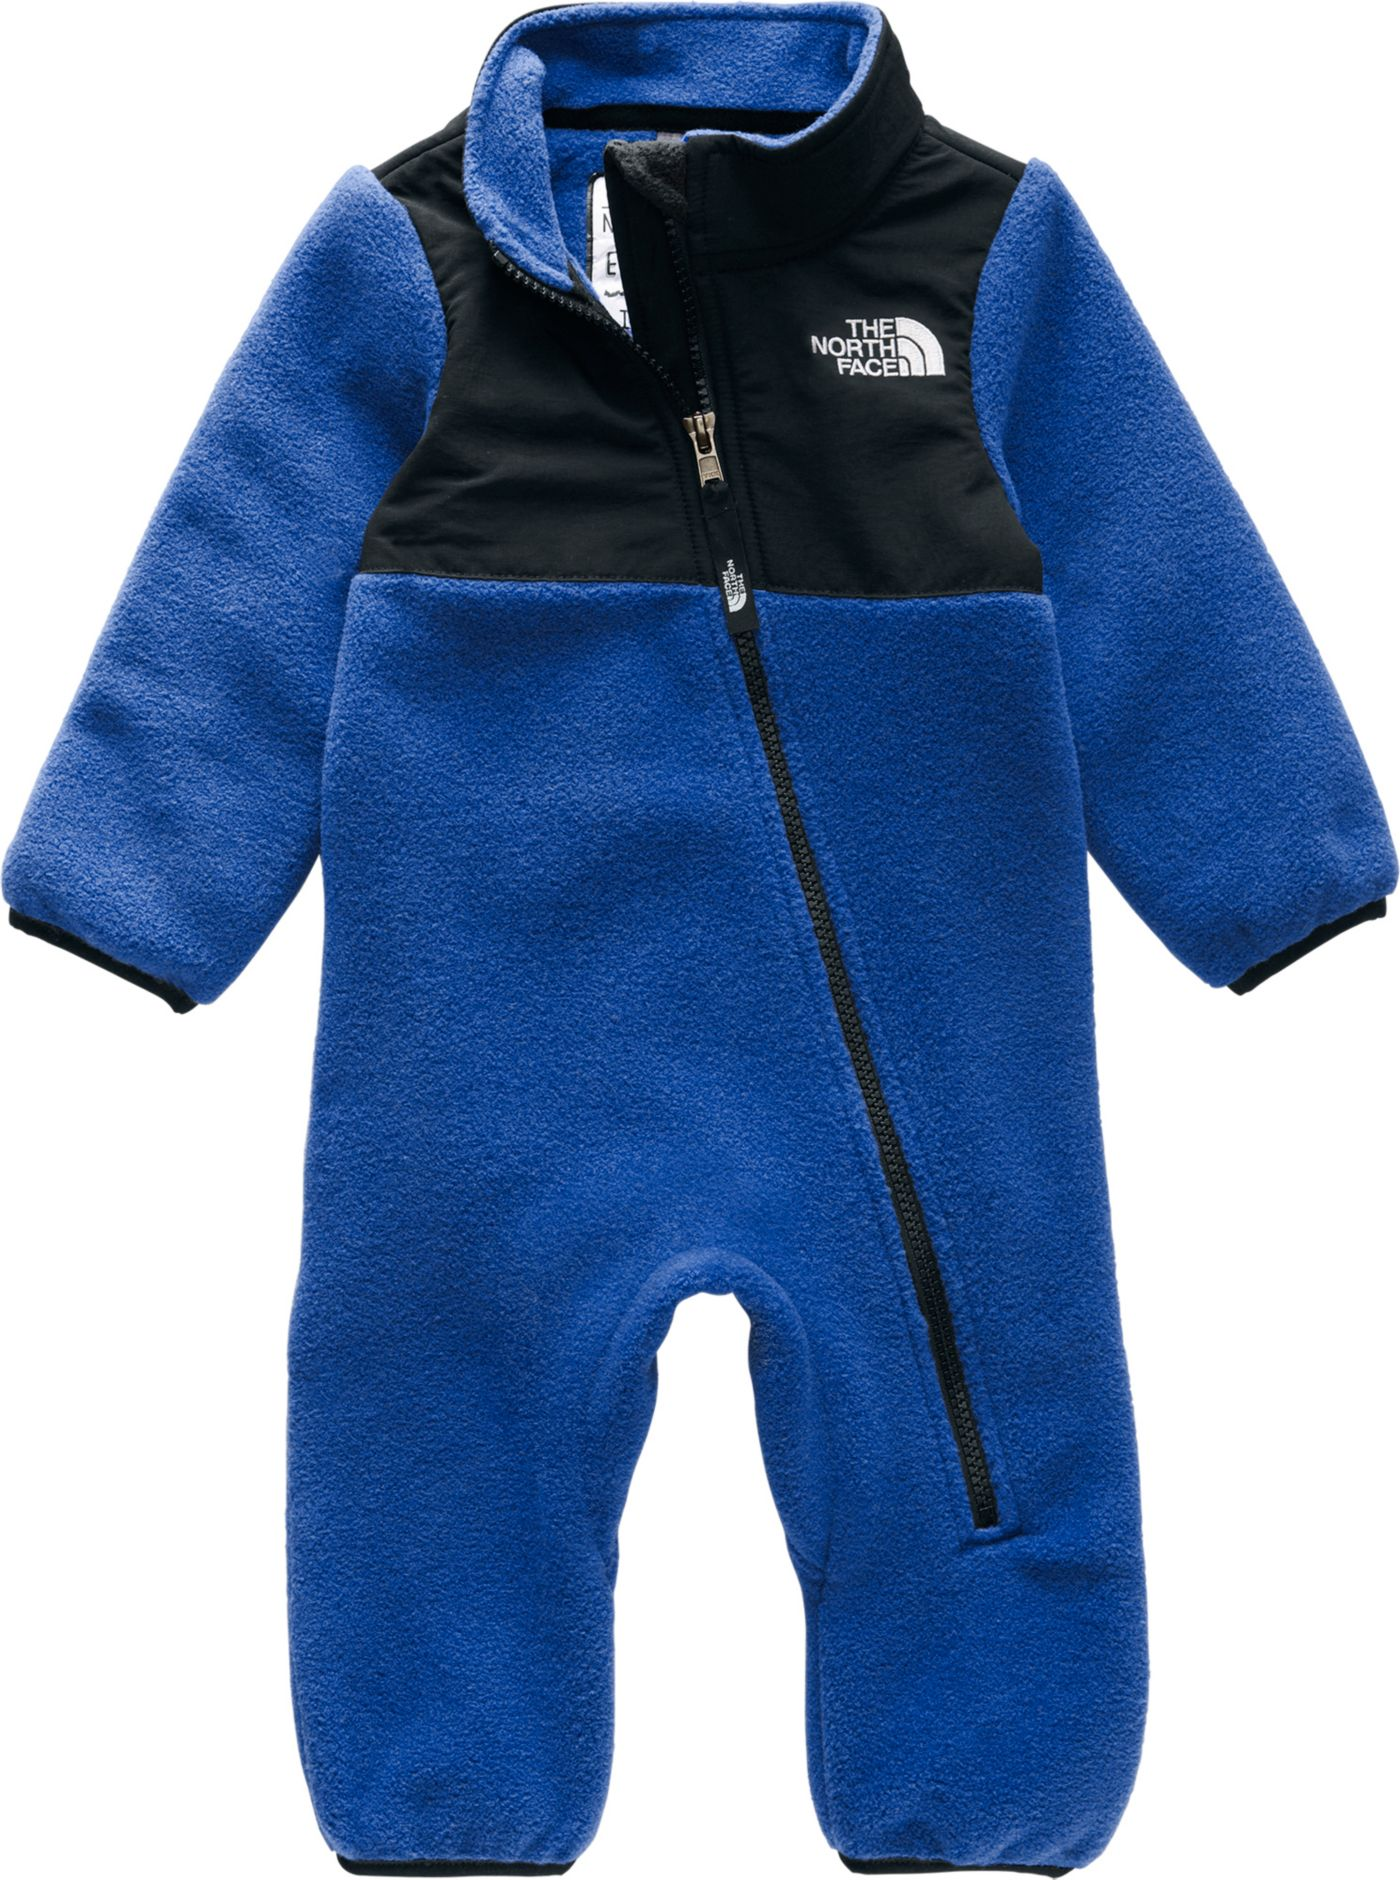 The North Face Infant Denali Fleece Onesie